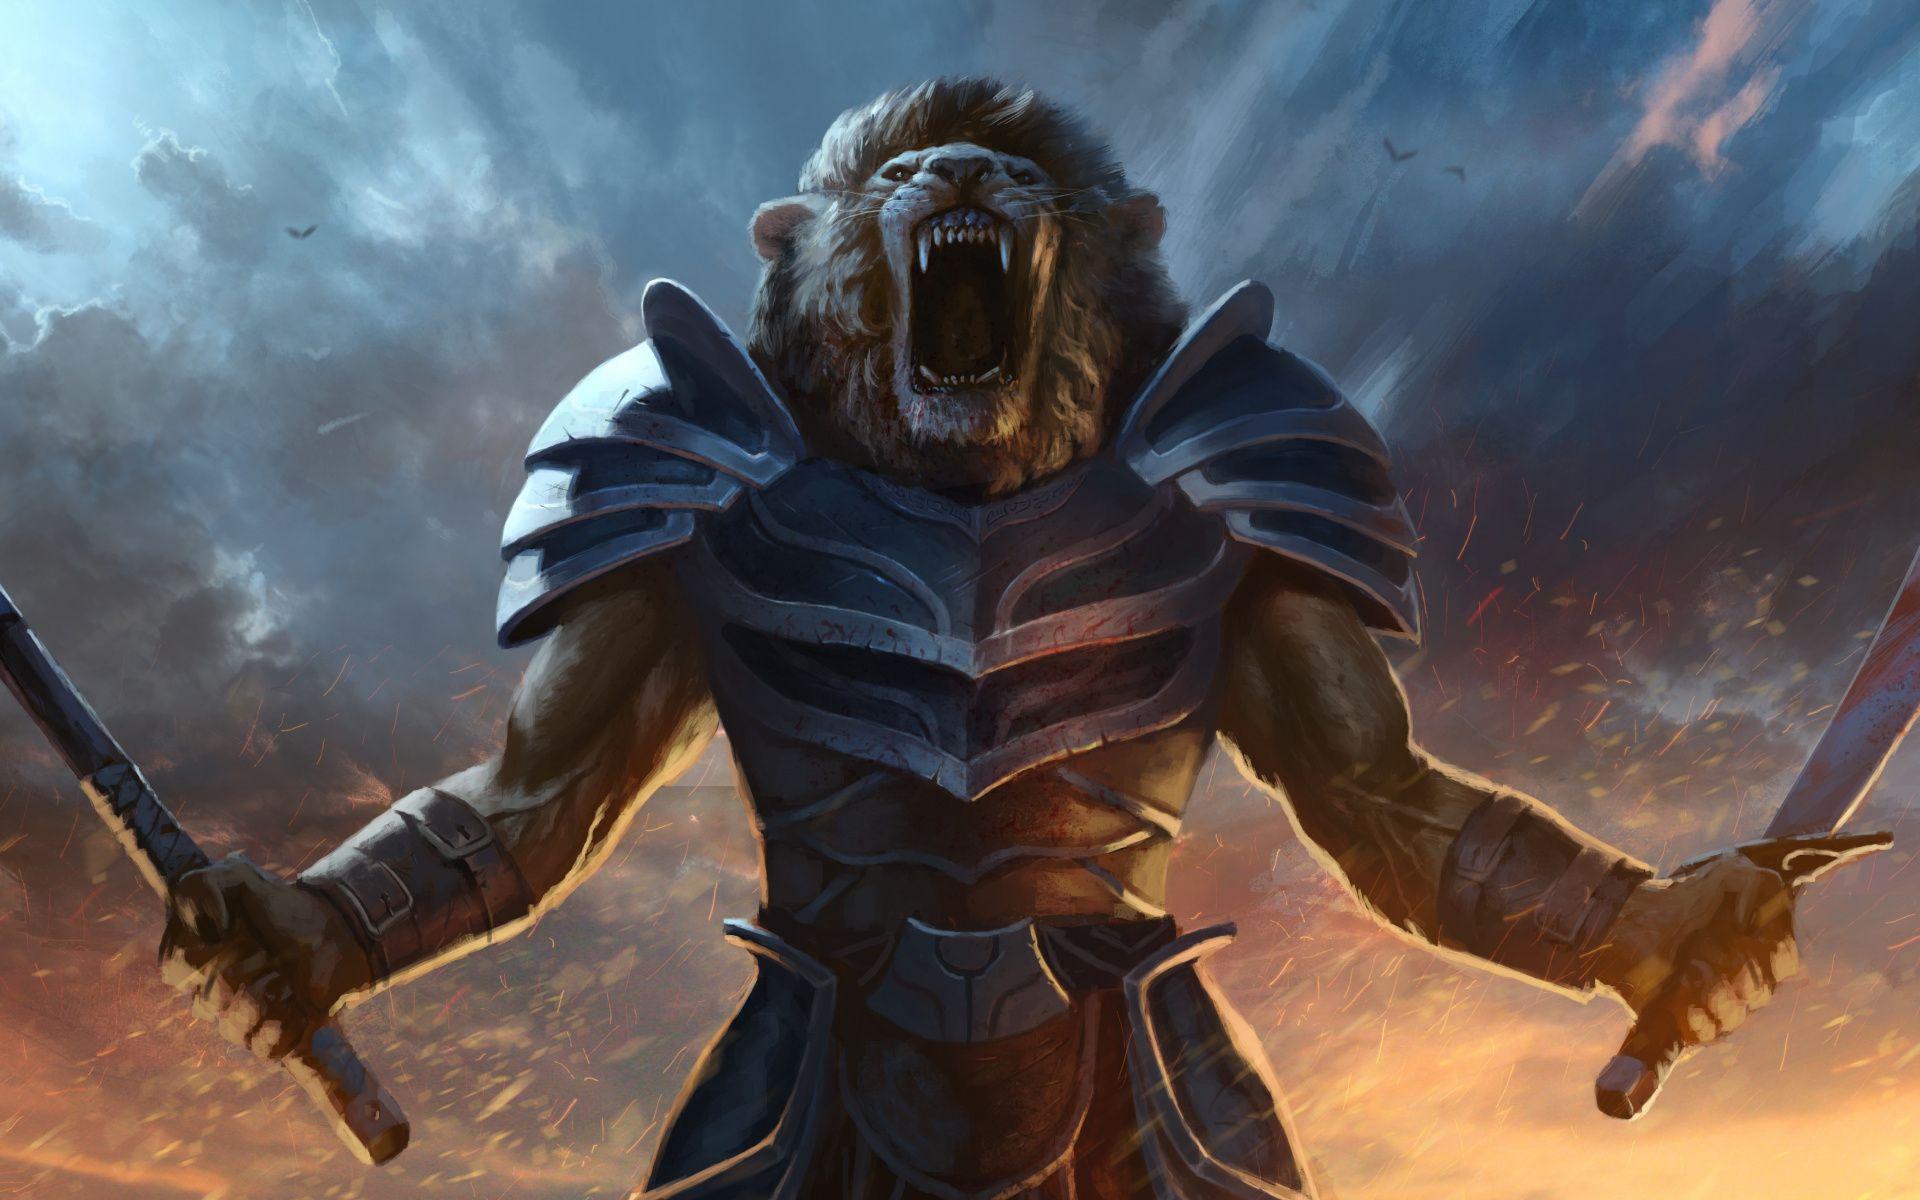 Download 1920x1200 wallpaper Battle, cry lion, artwork